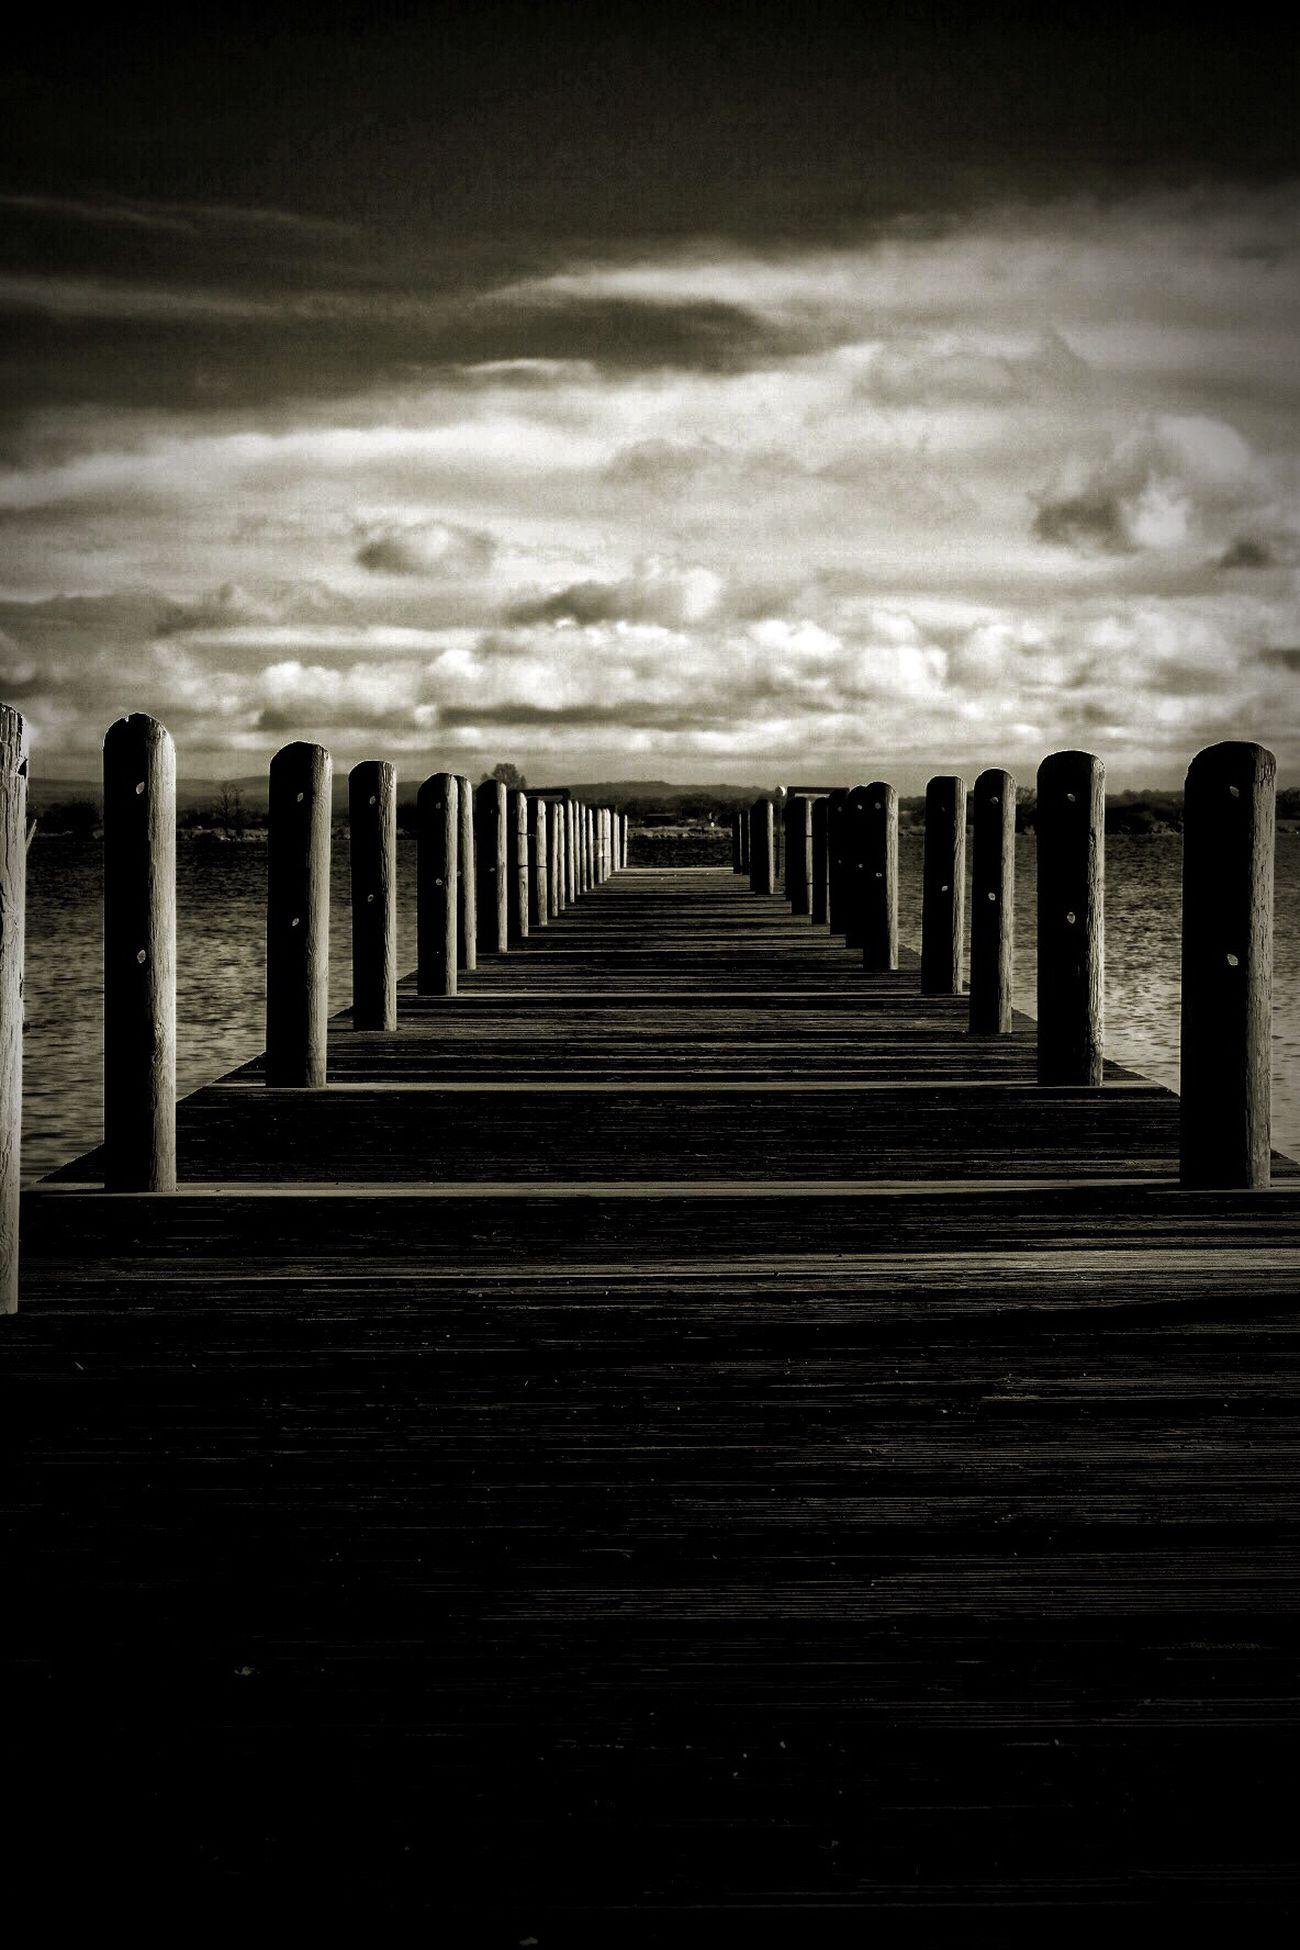 In A Row Sky No People Cloud - Sky Nature Outdoors Day Tranquility Tranquil Scene The Way Forward Horizon Over Water Pier Water Fujifilm Fujifilm_xseries Myfujifilm Ireland Nireland